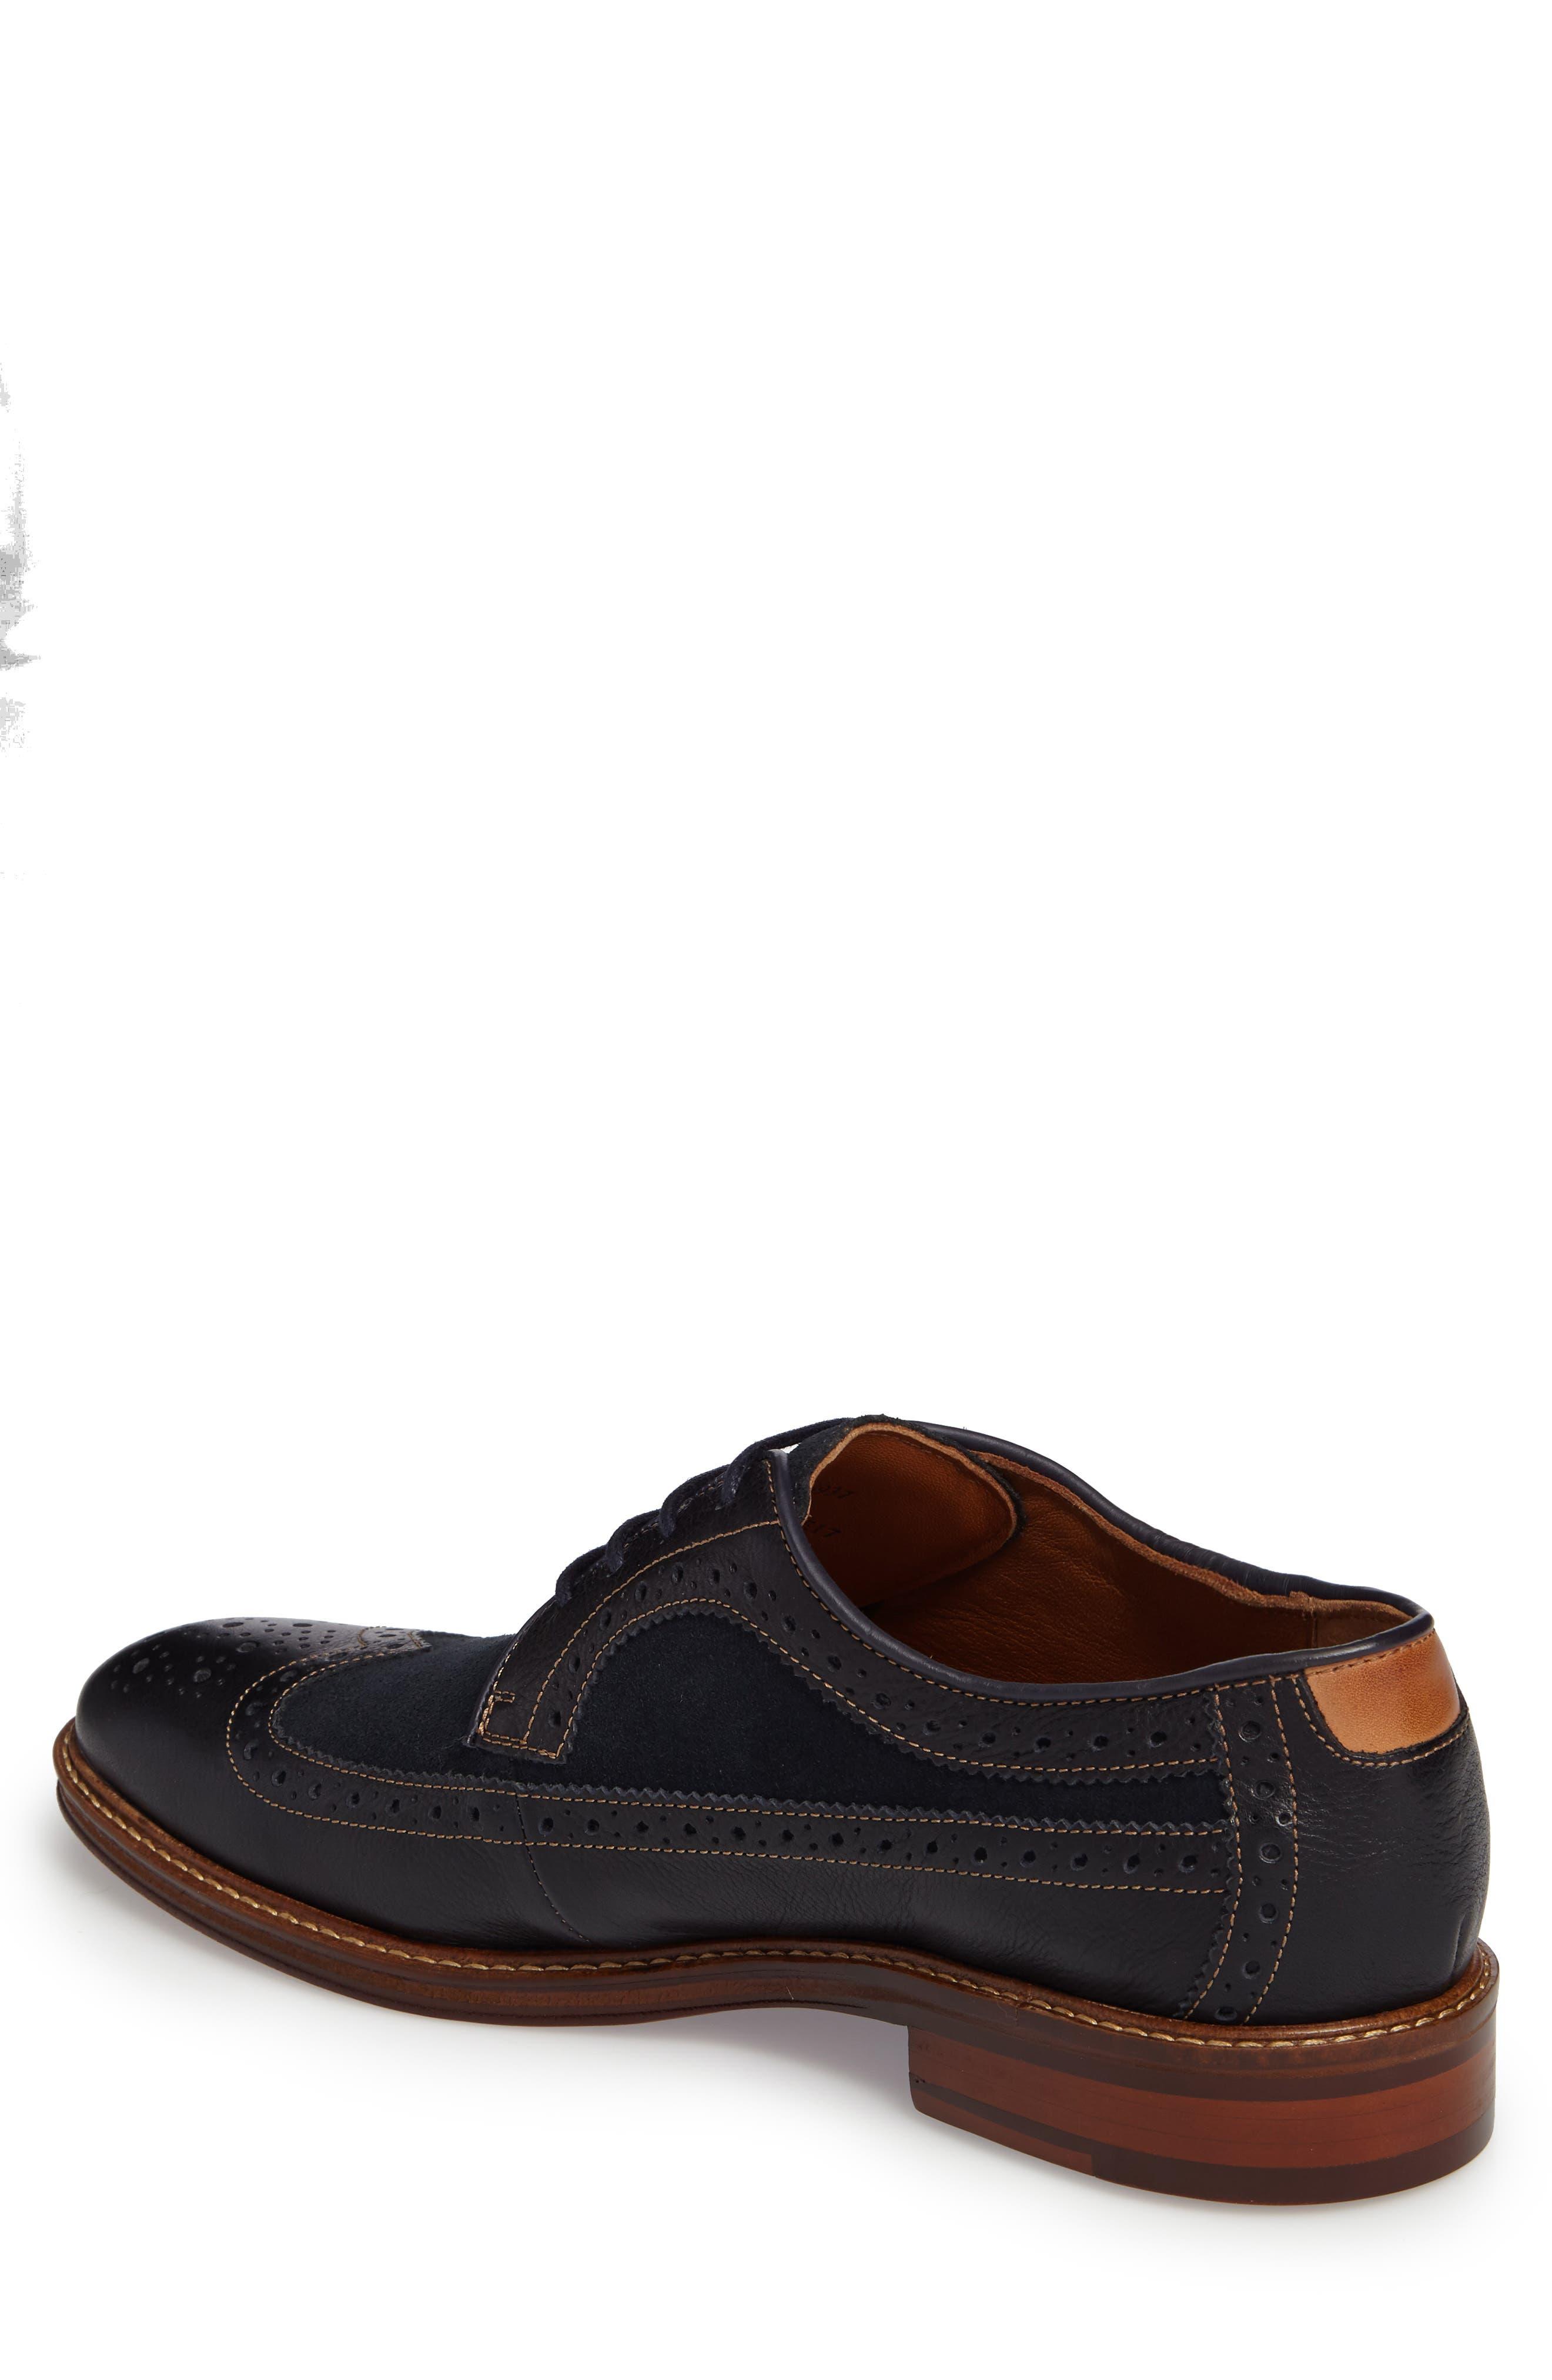 Warner Spectator Shoe,                             Alternate thumbnail 6, color,